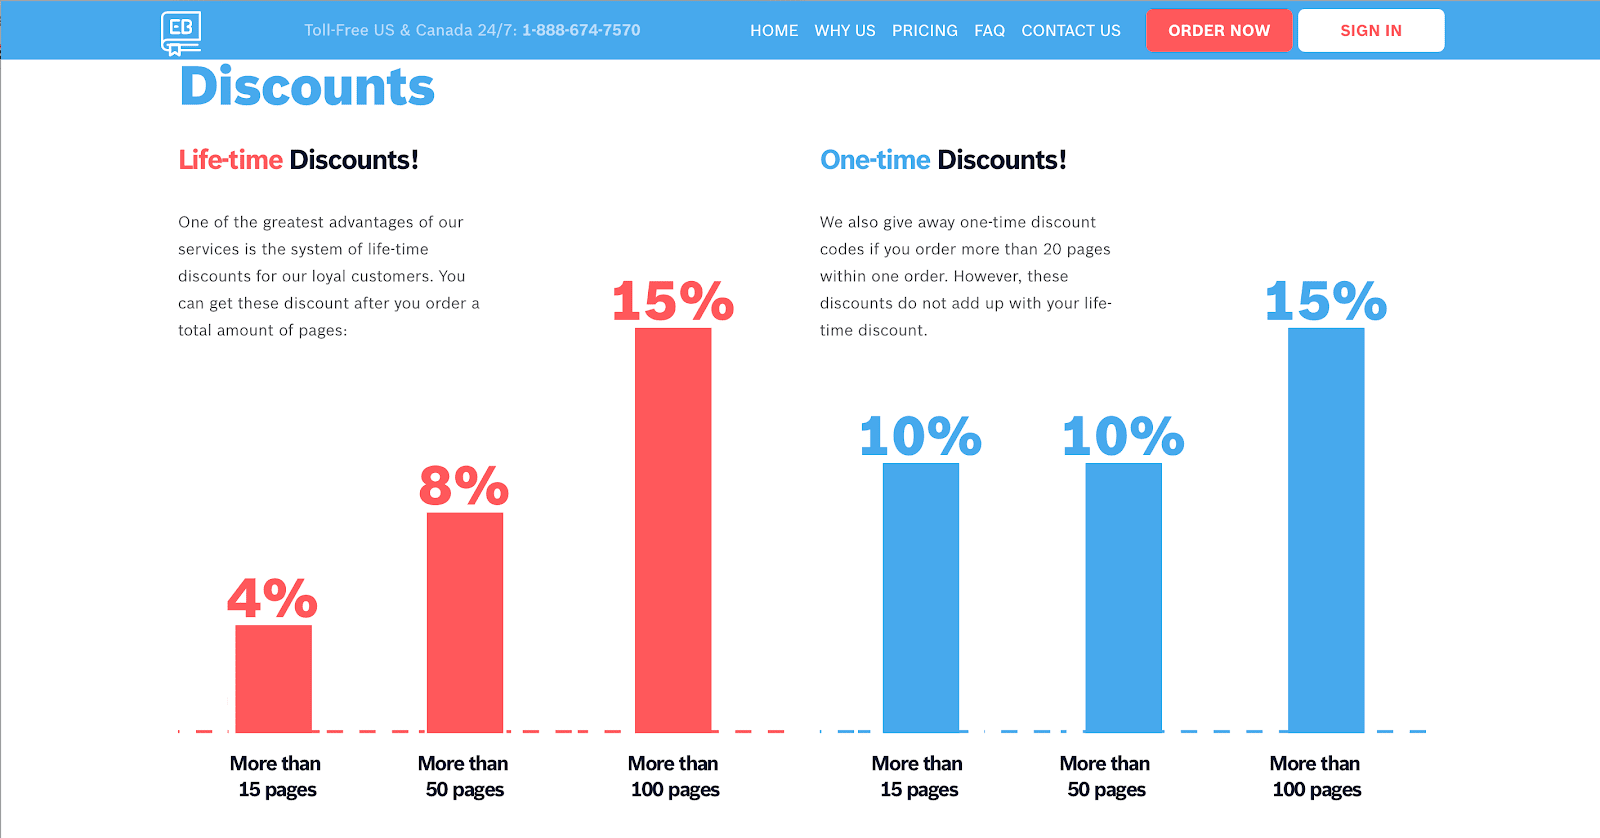 essaybox.org discount